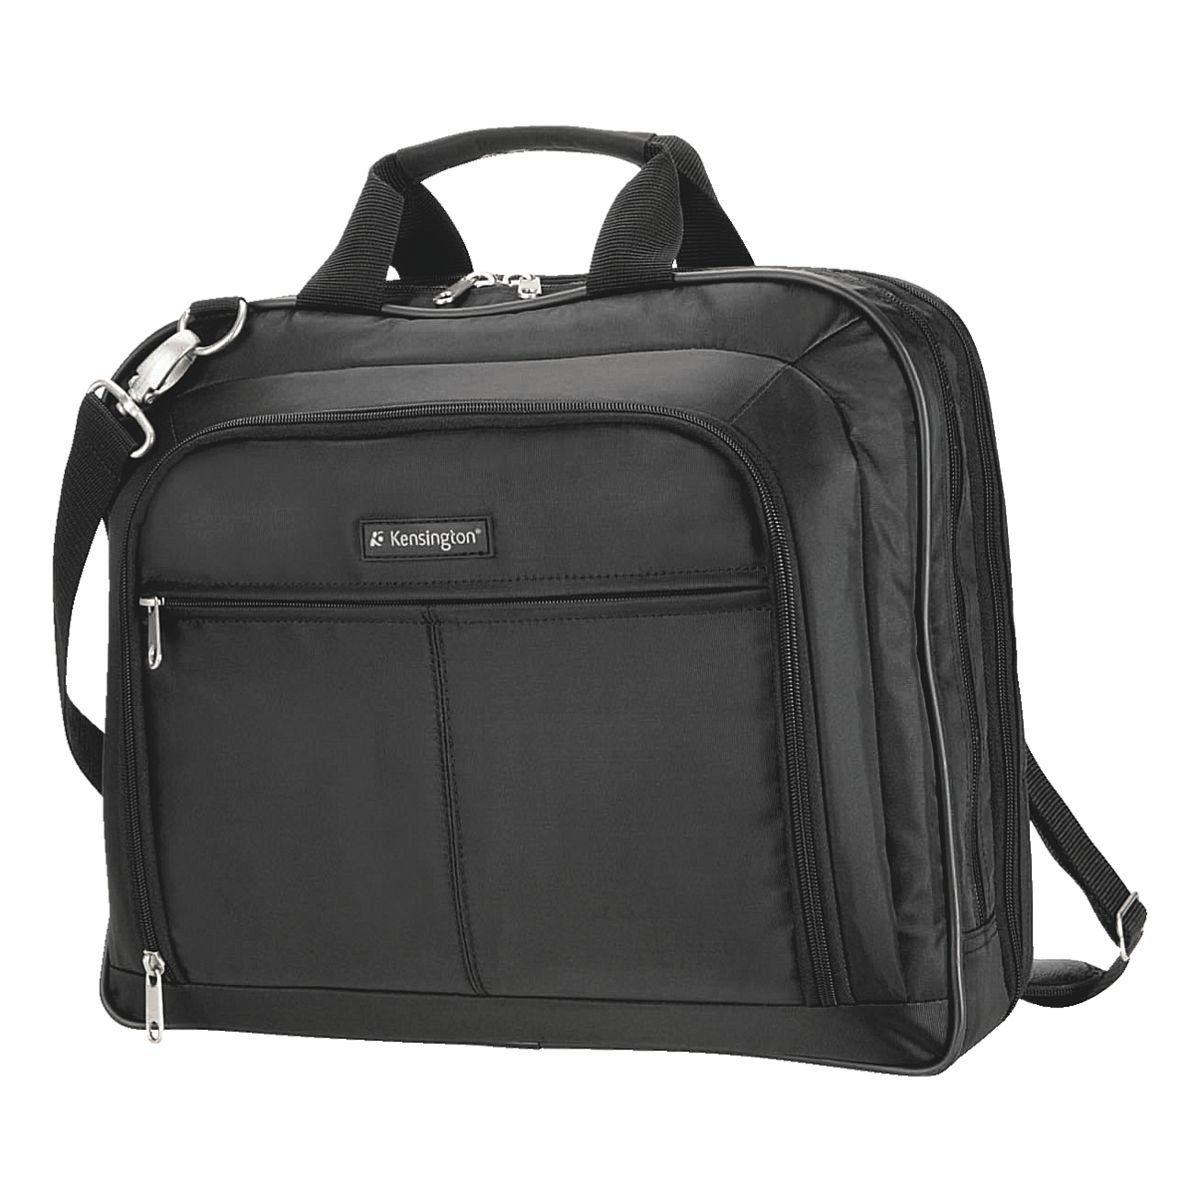 KENSINGTON Laptoptasche »SP40«